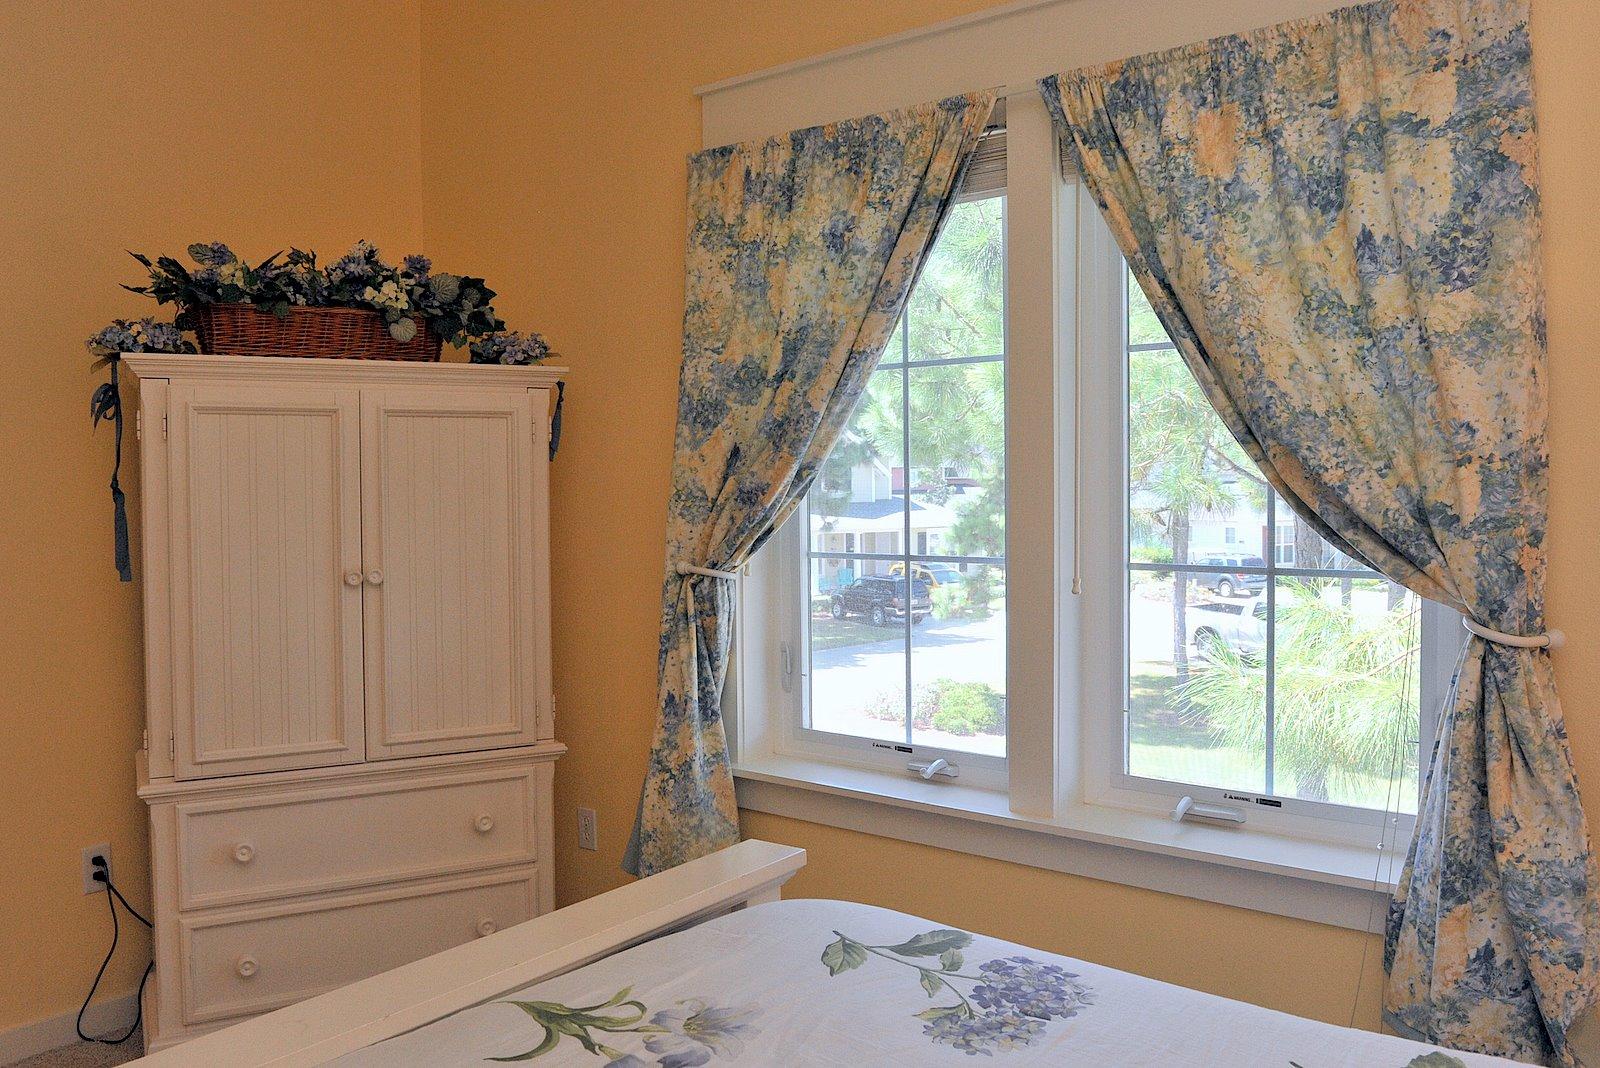 1280 Laurel Grove Condo rental in Sandestin Rentals ~ Cottages and Villas  in Destin Florida - #11